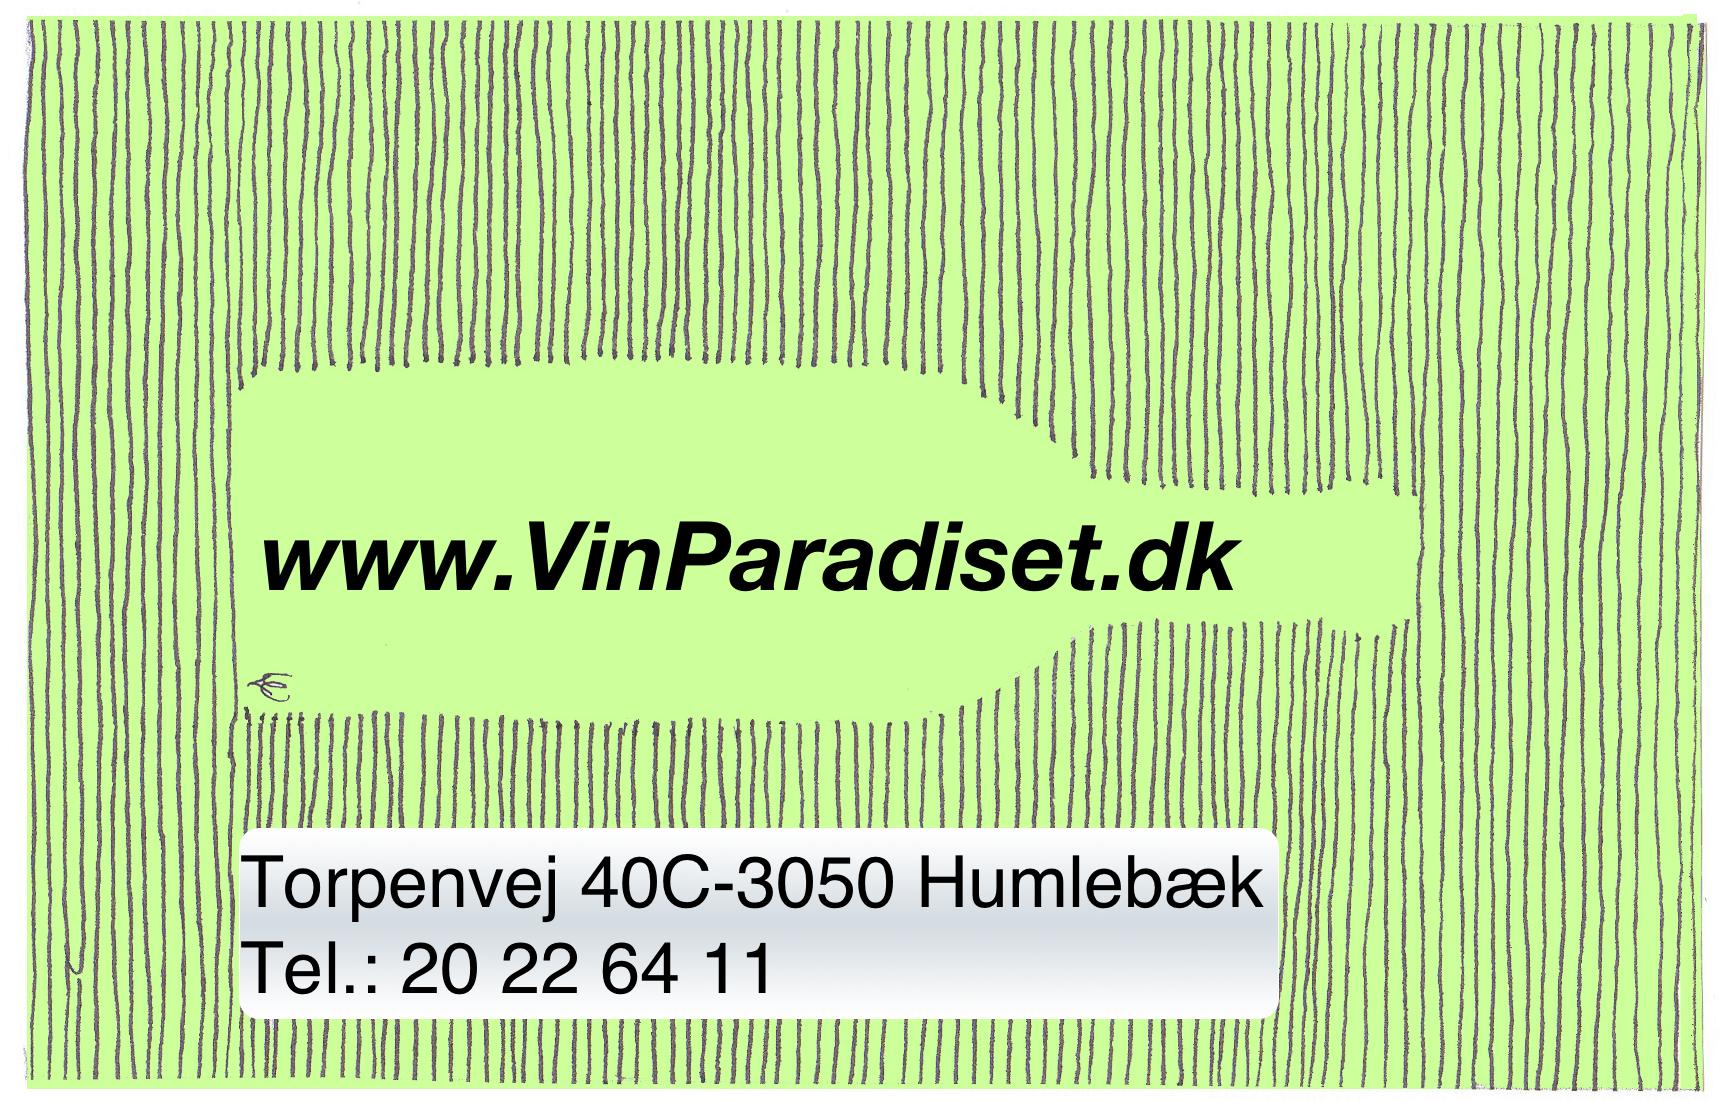 VinParadiset